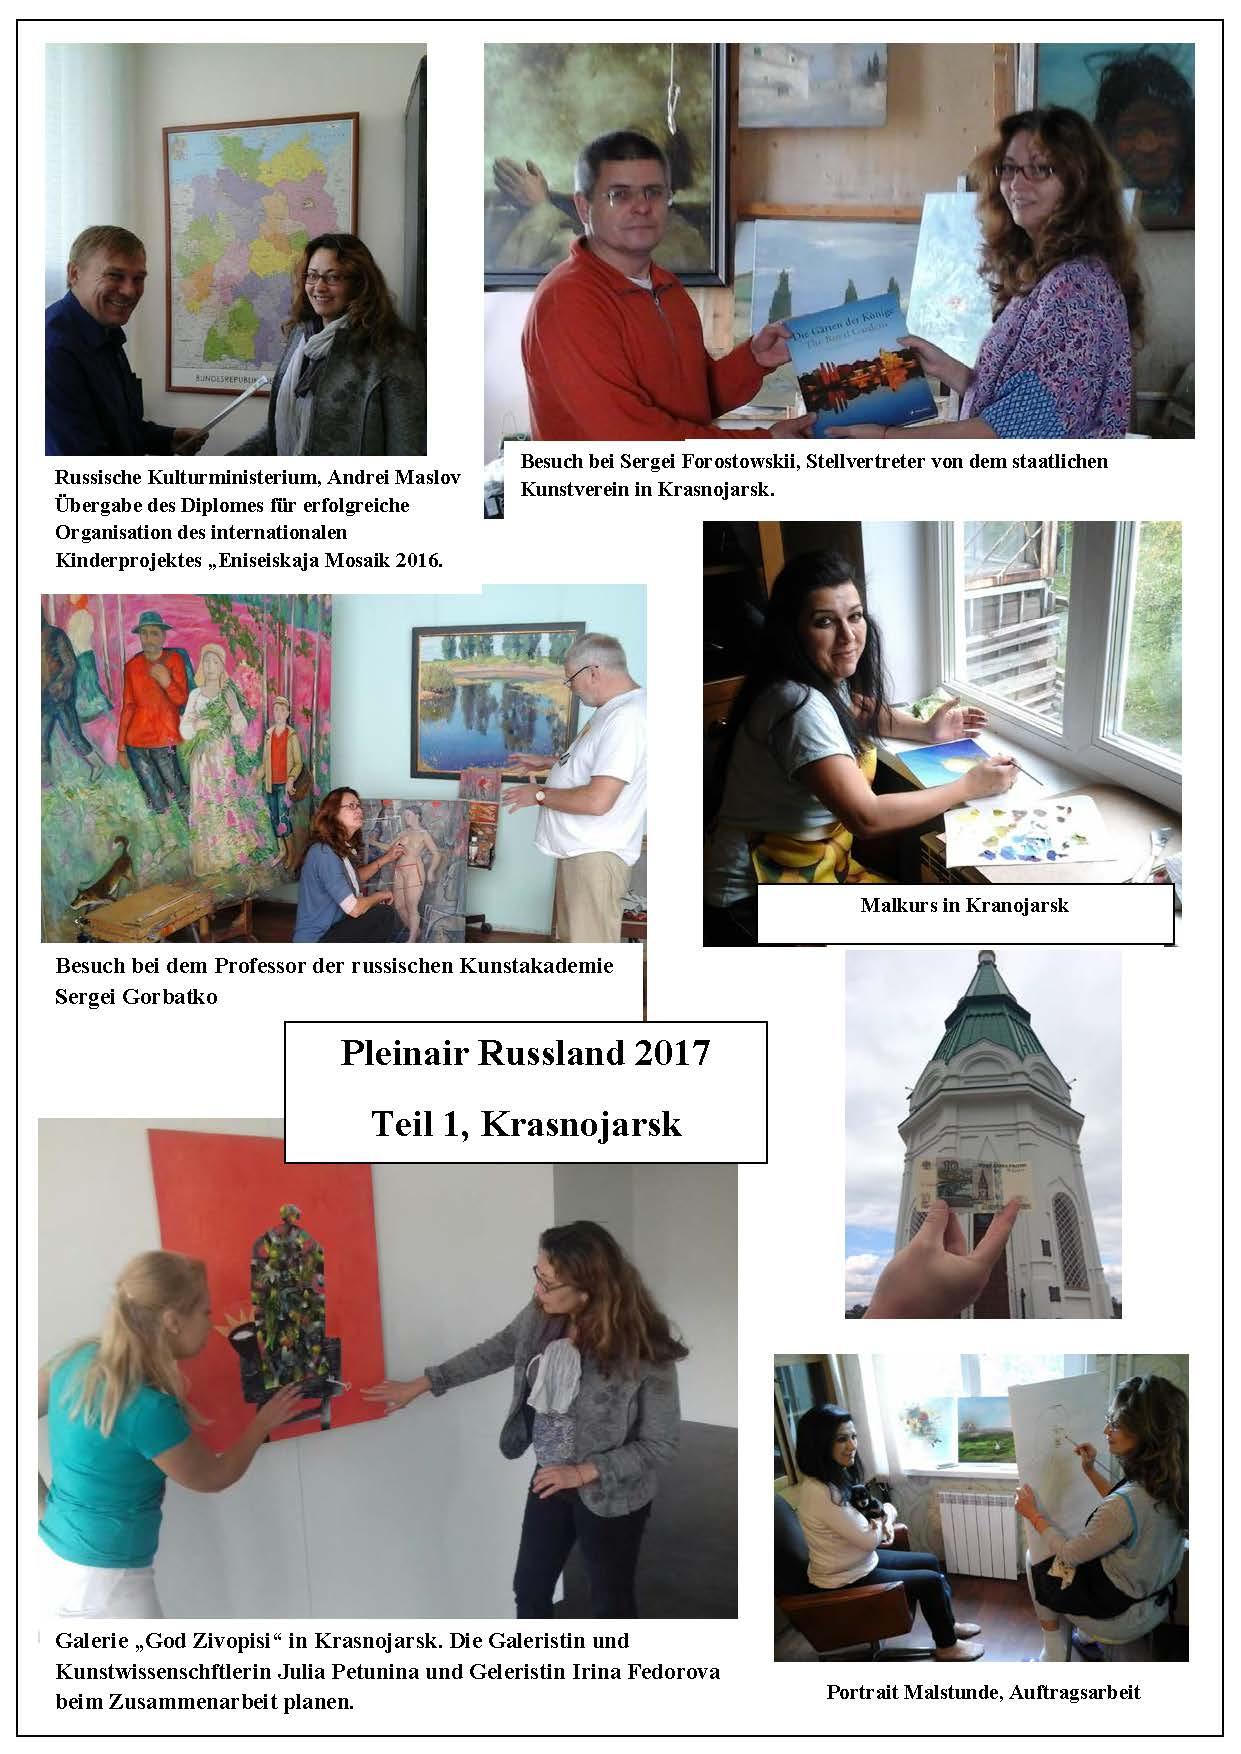 Pleinair Russland 2017,2